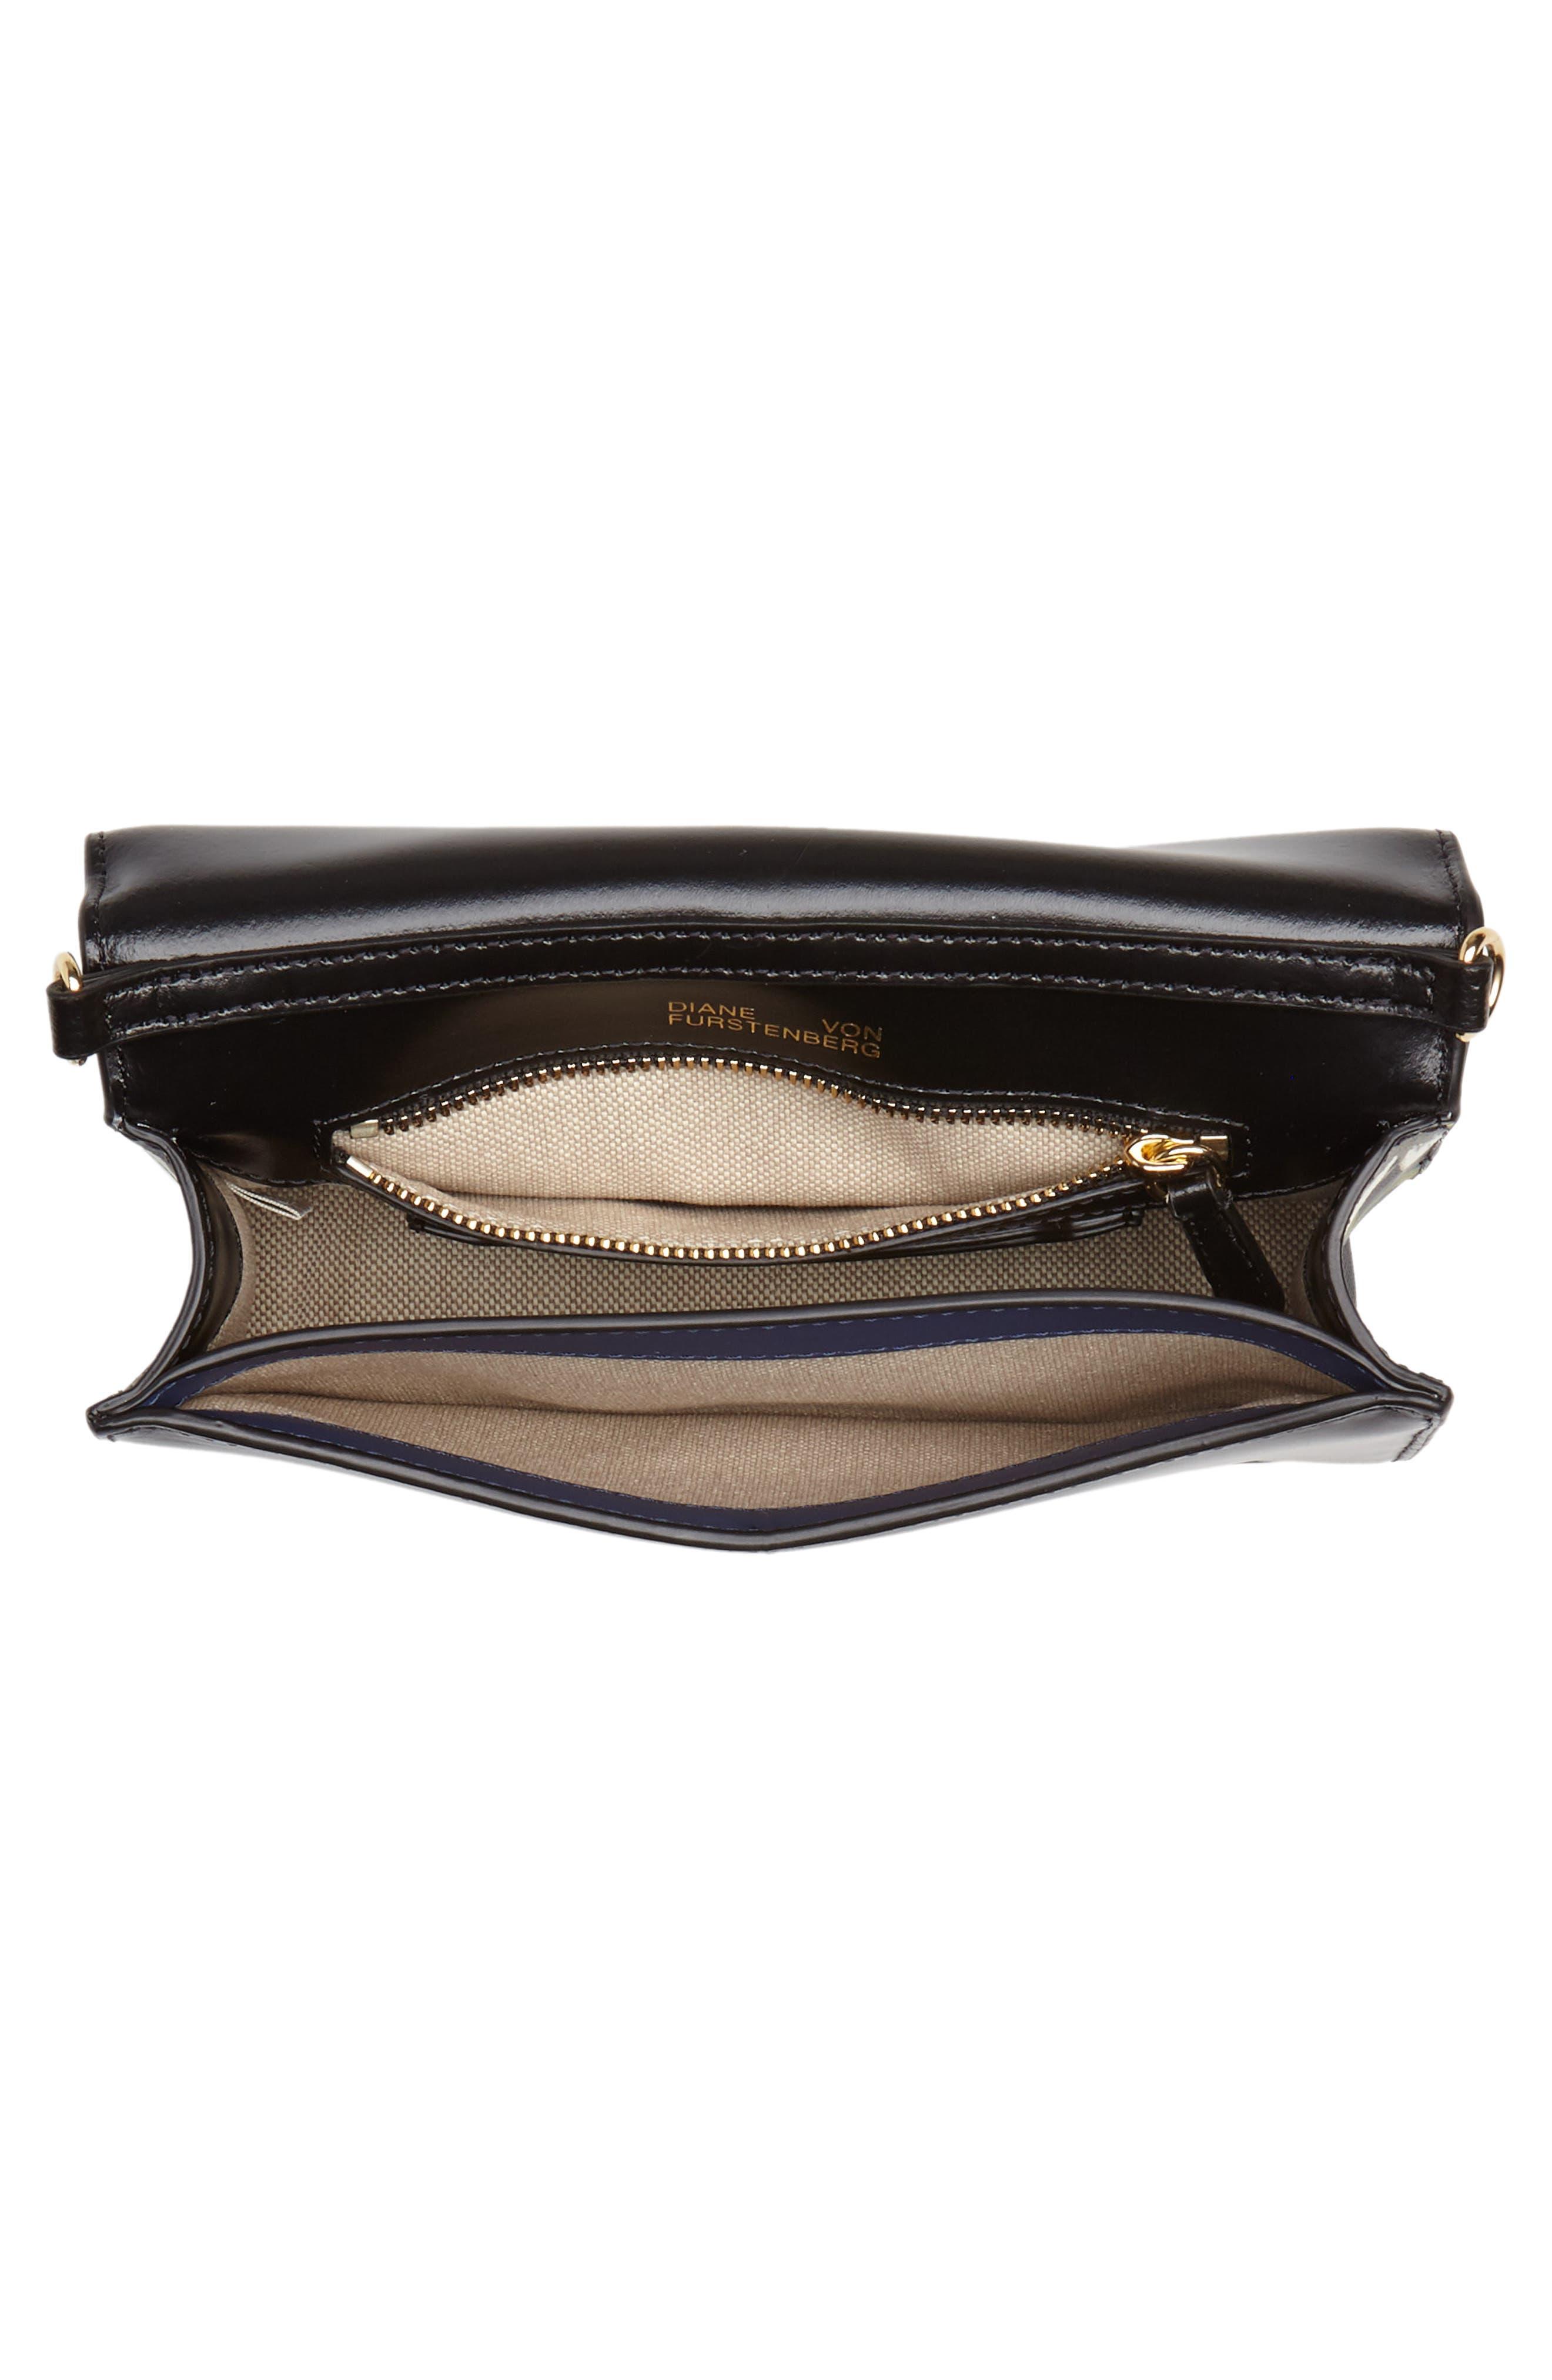 Soirée Leather Convertible Crossbody Bag,                             Alternate thumbnail 13, color,